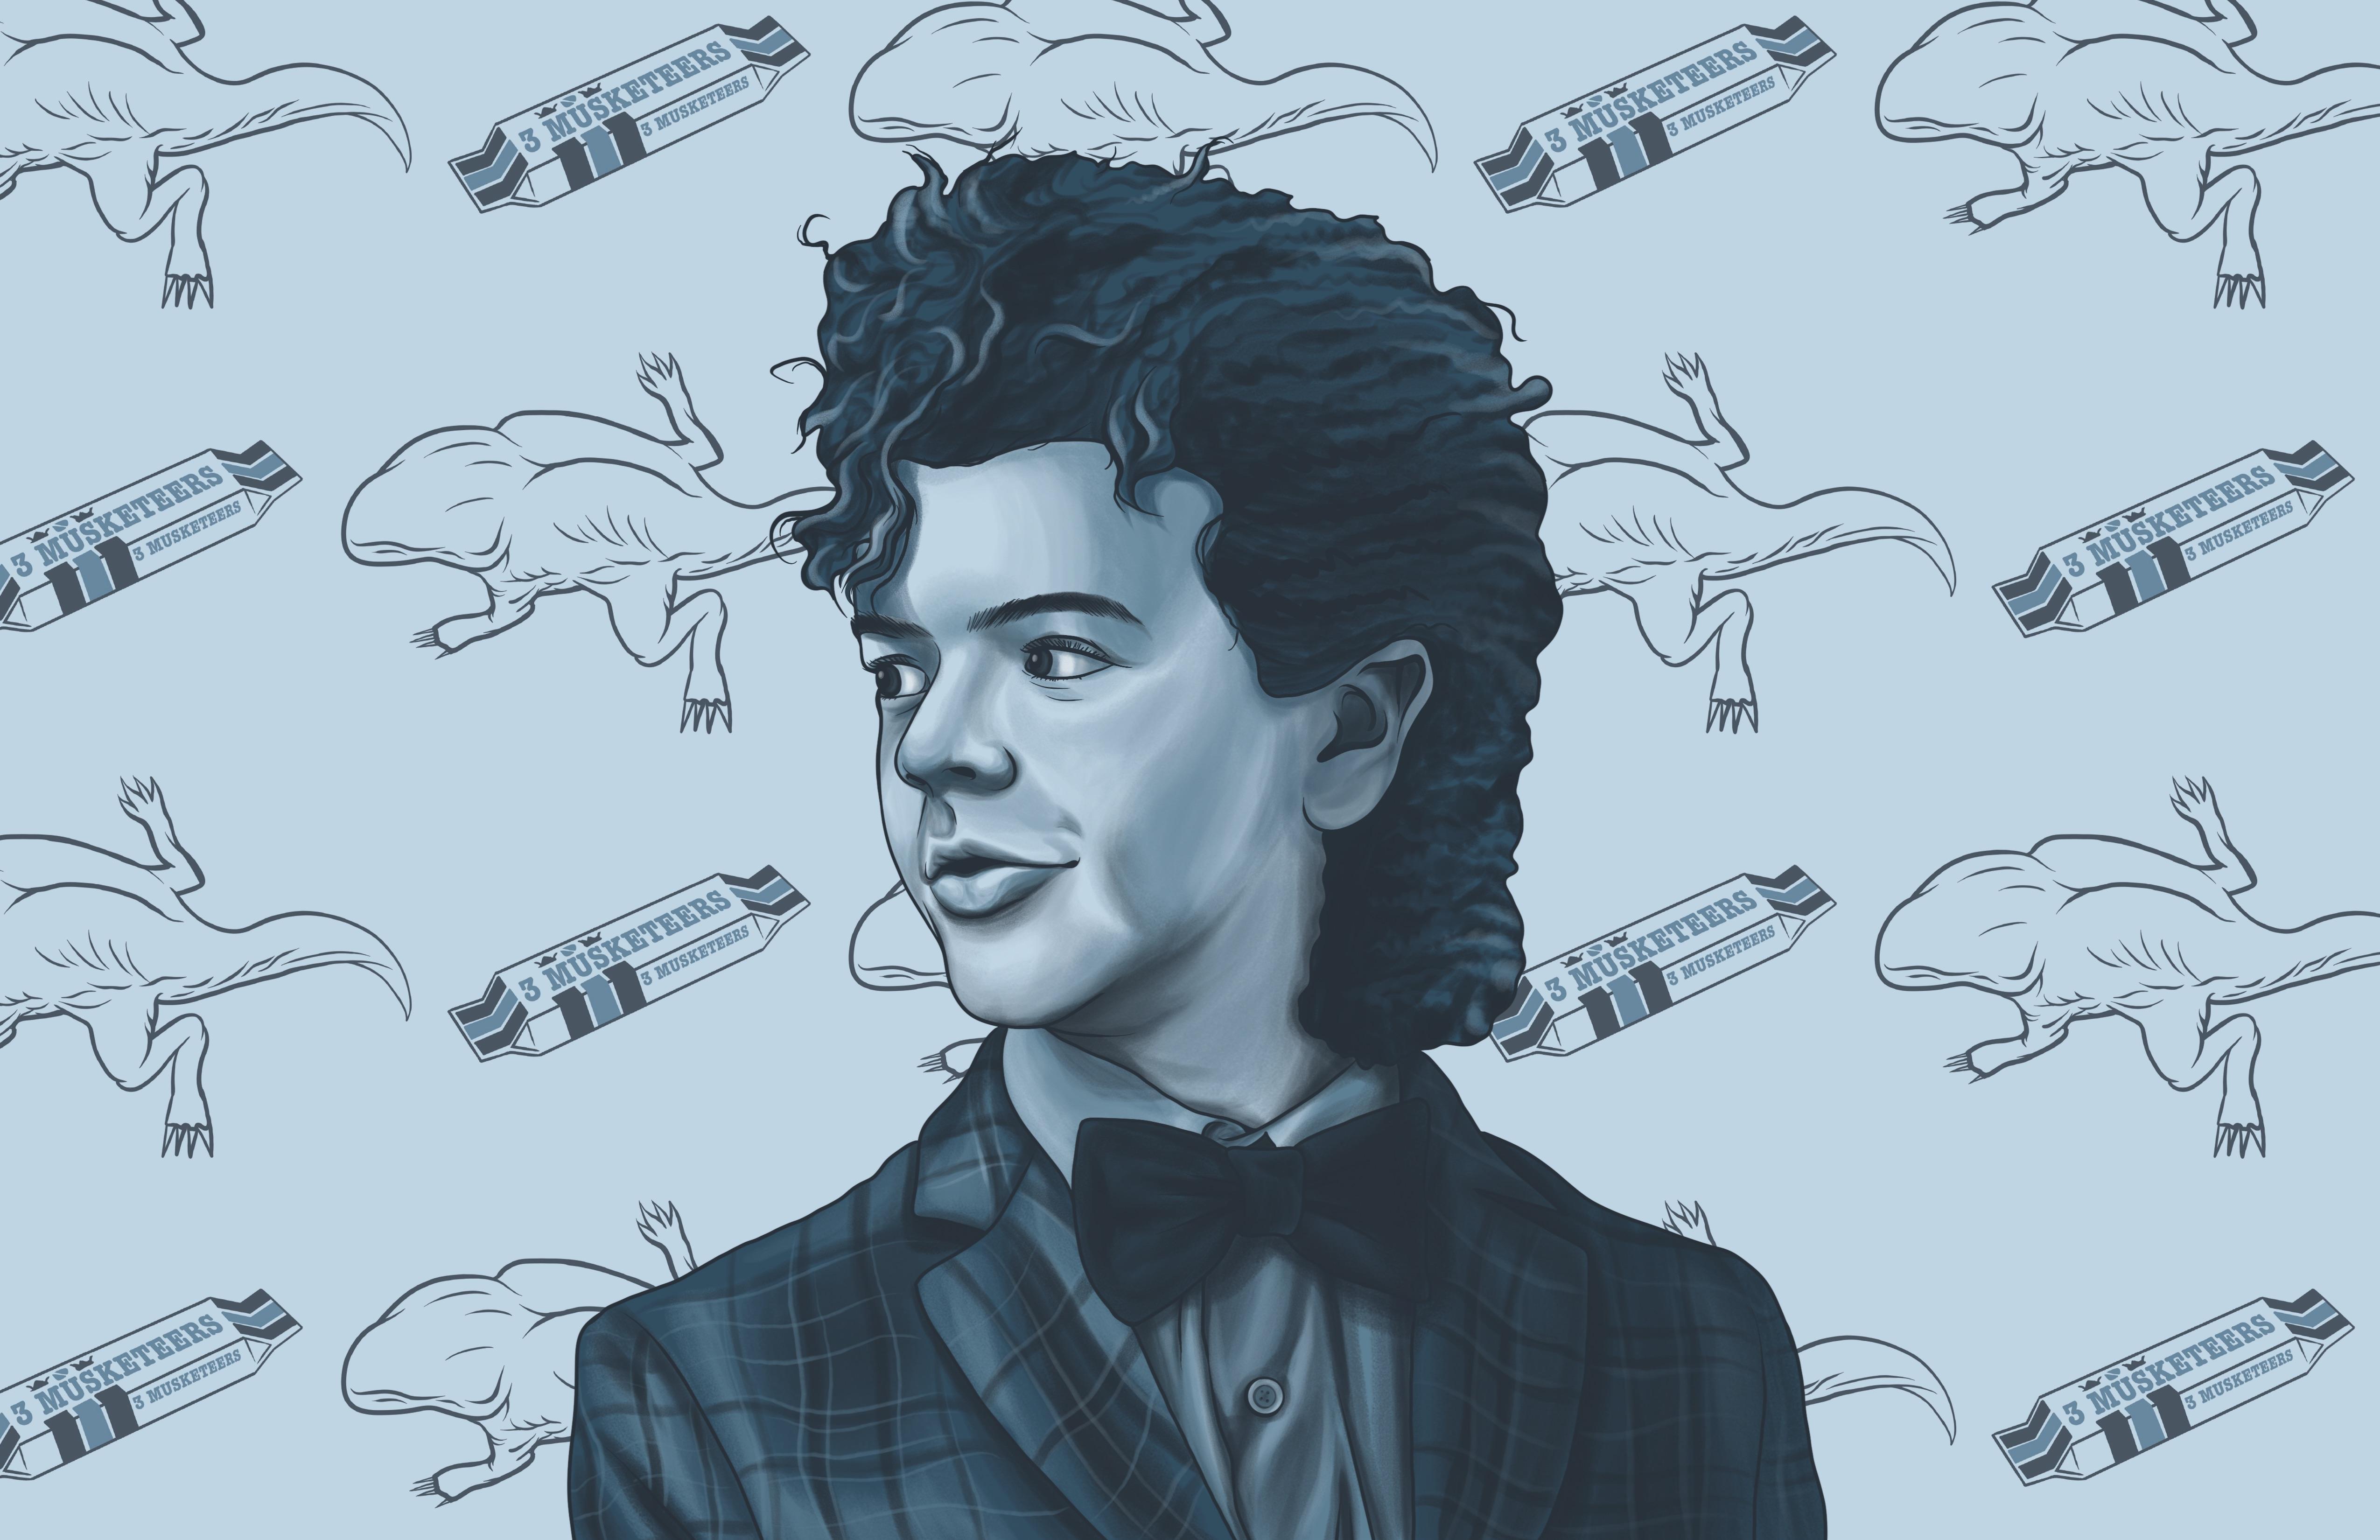 2048x2048 Anthem Ipad Air Hd 4k Wallpapers Images: 2048x2048 Dustin Stranger Things Season 2 FanArt Ipad Air